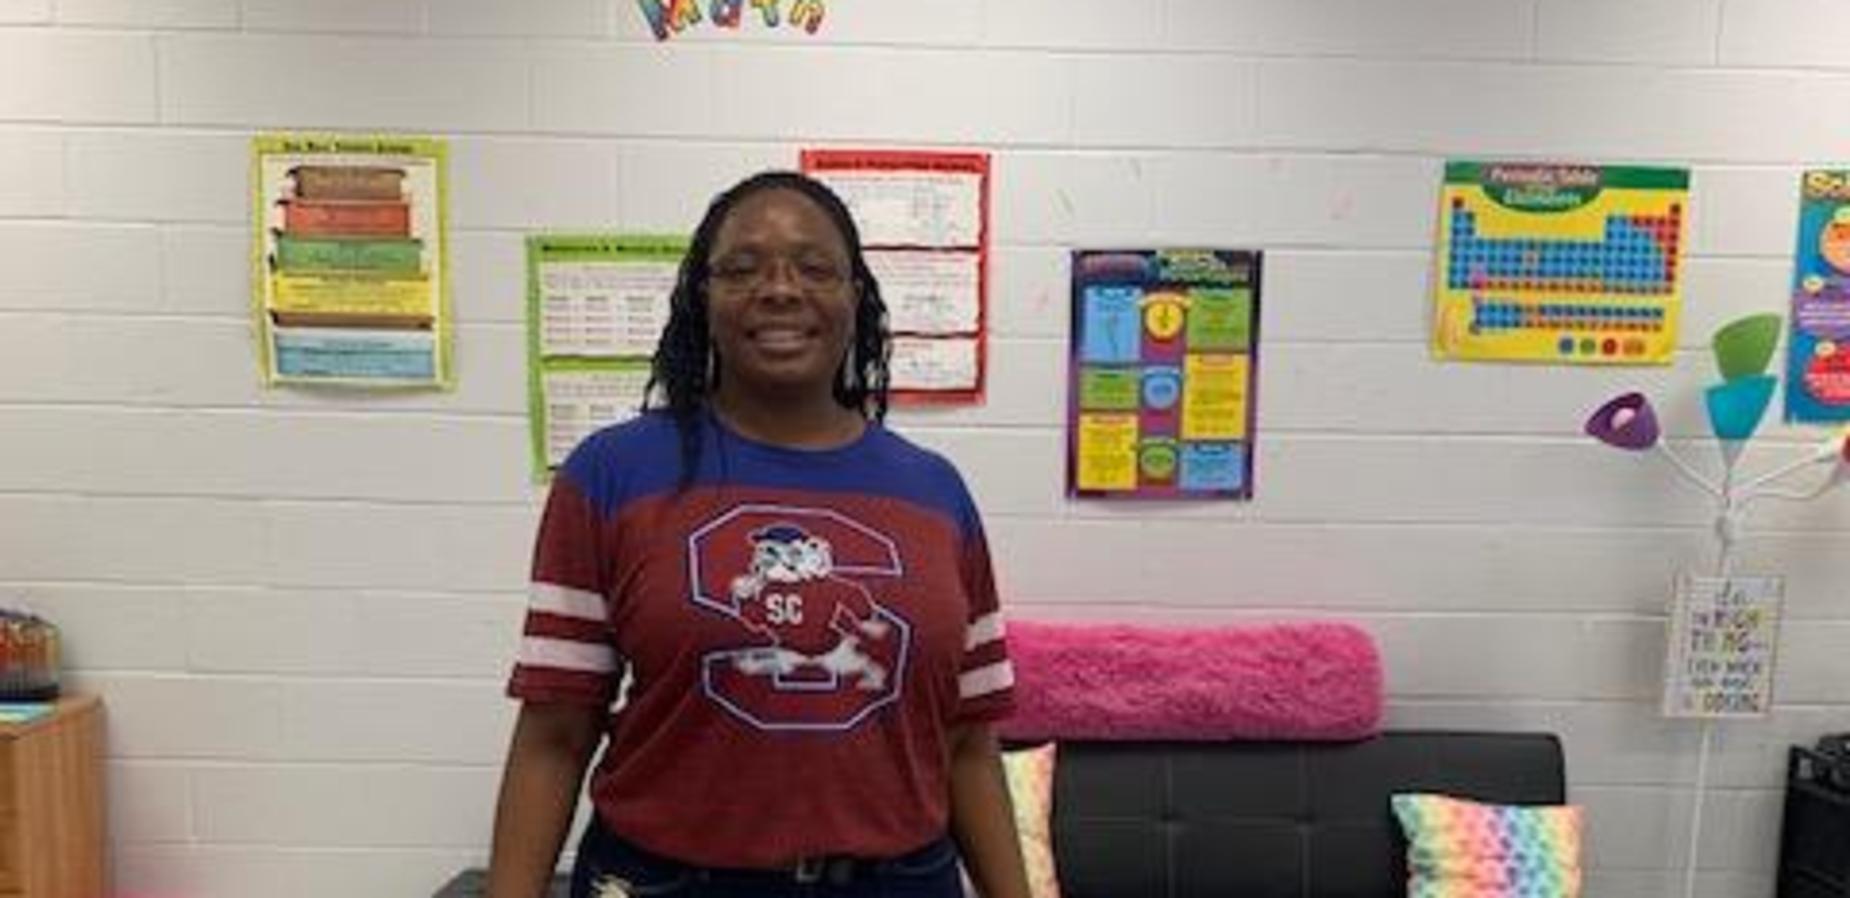 Mrs. Pauling representing SC State University